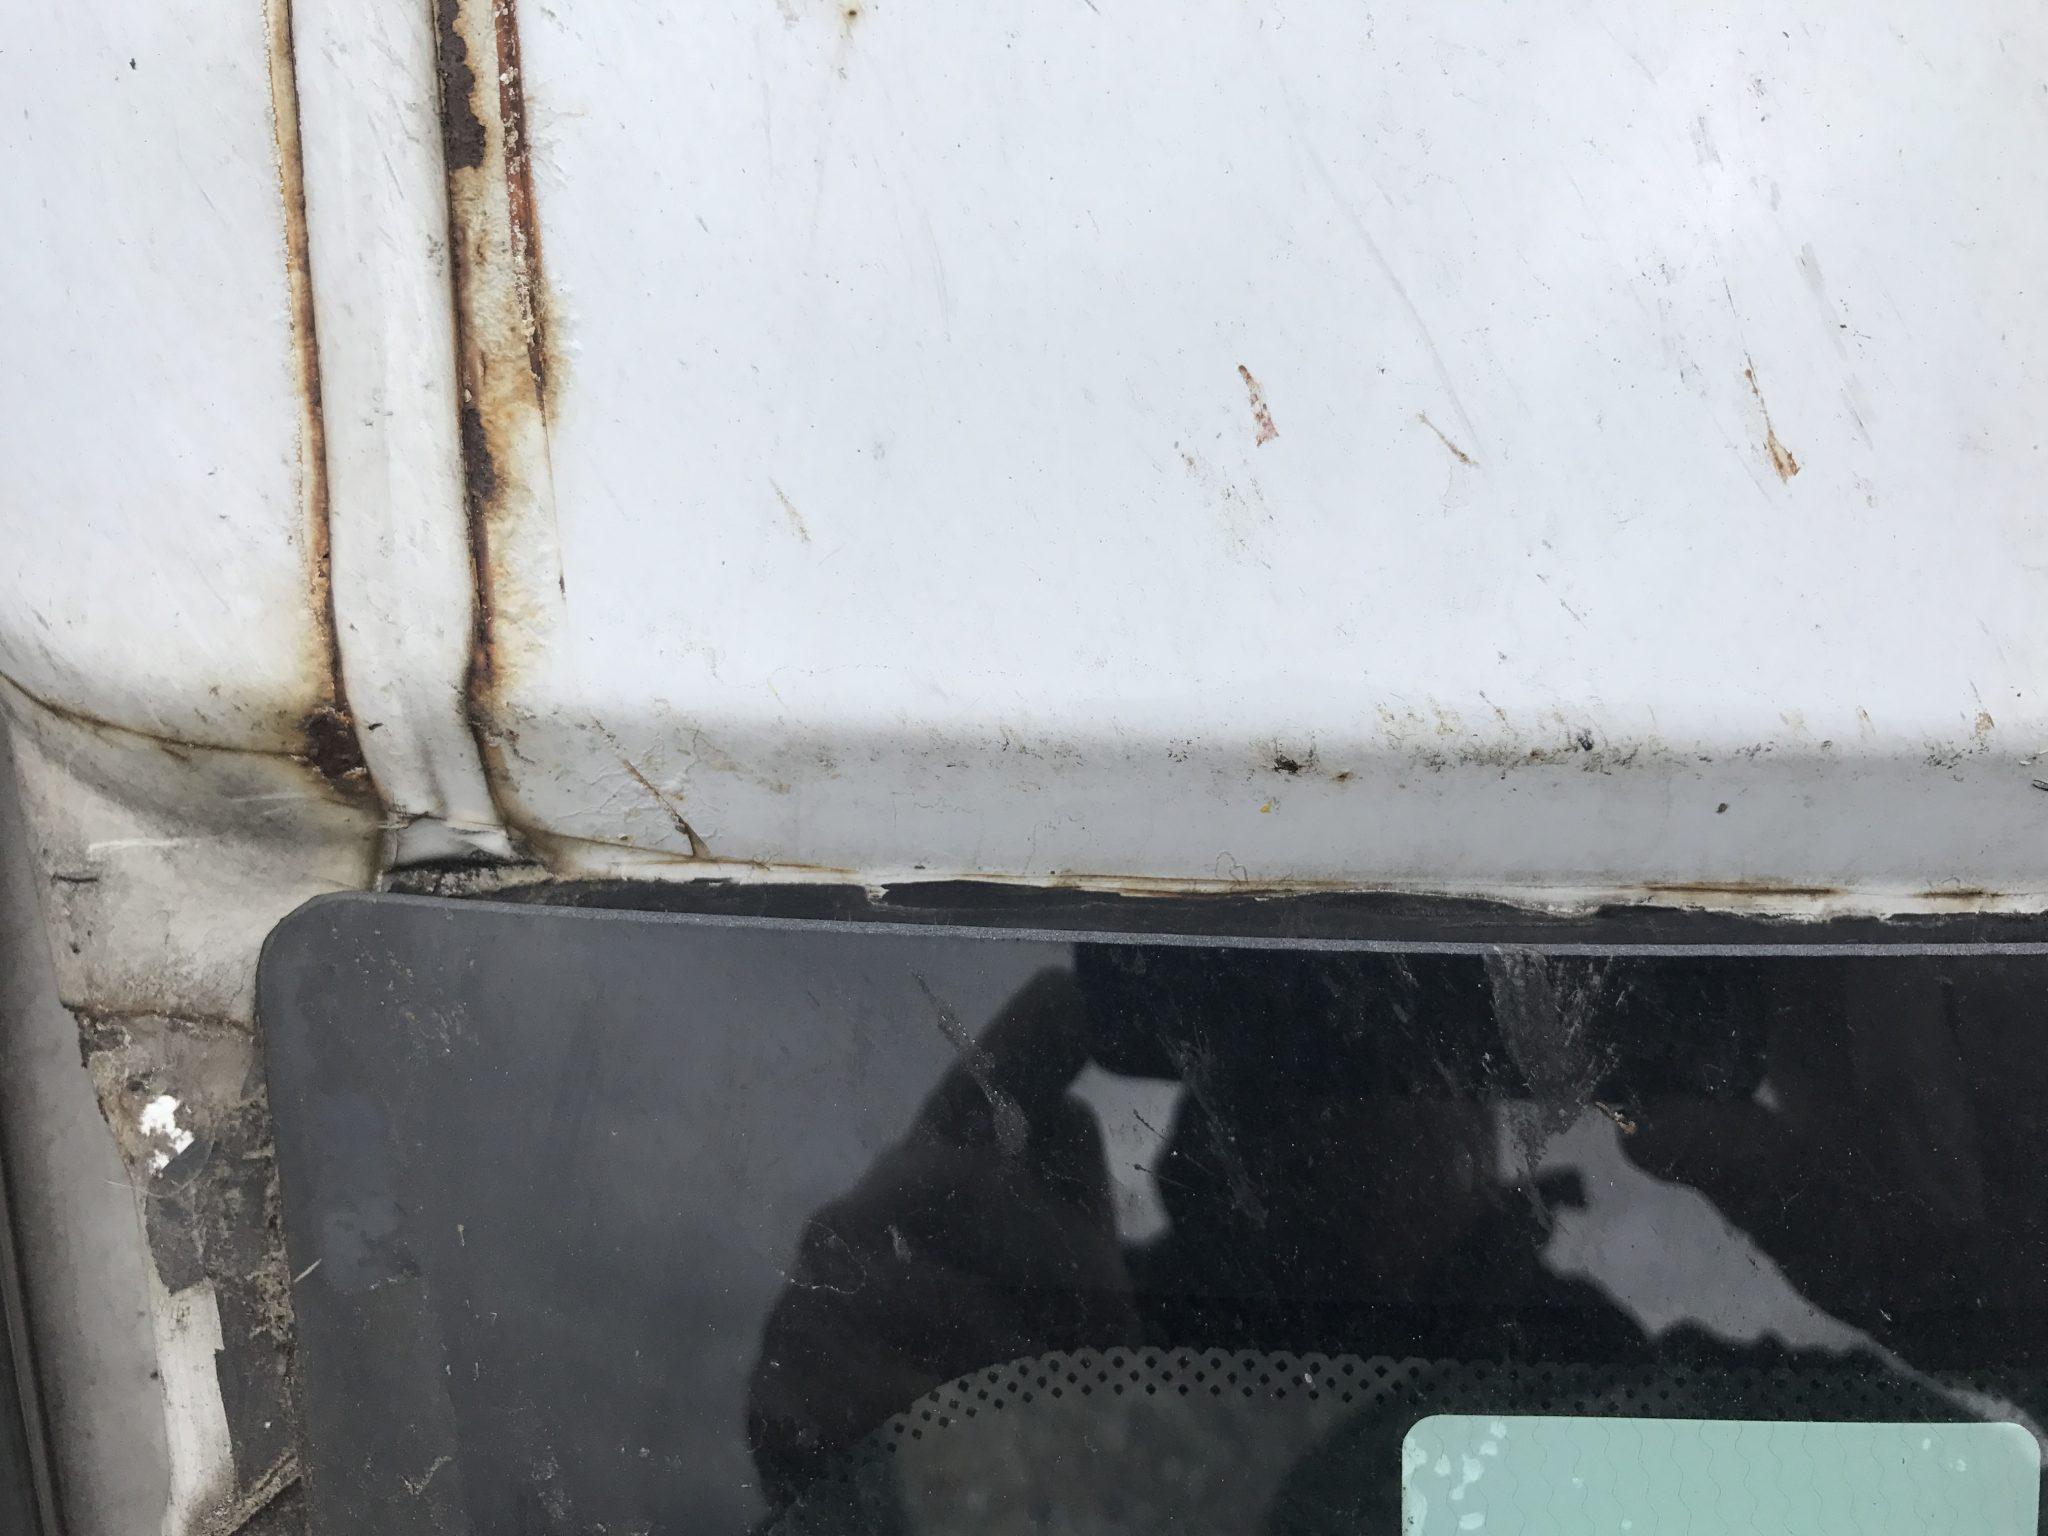 Windscreen Fitting Damage